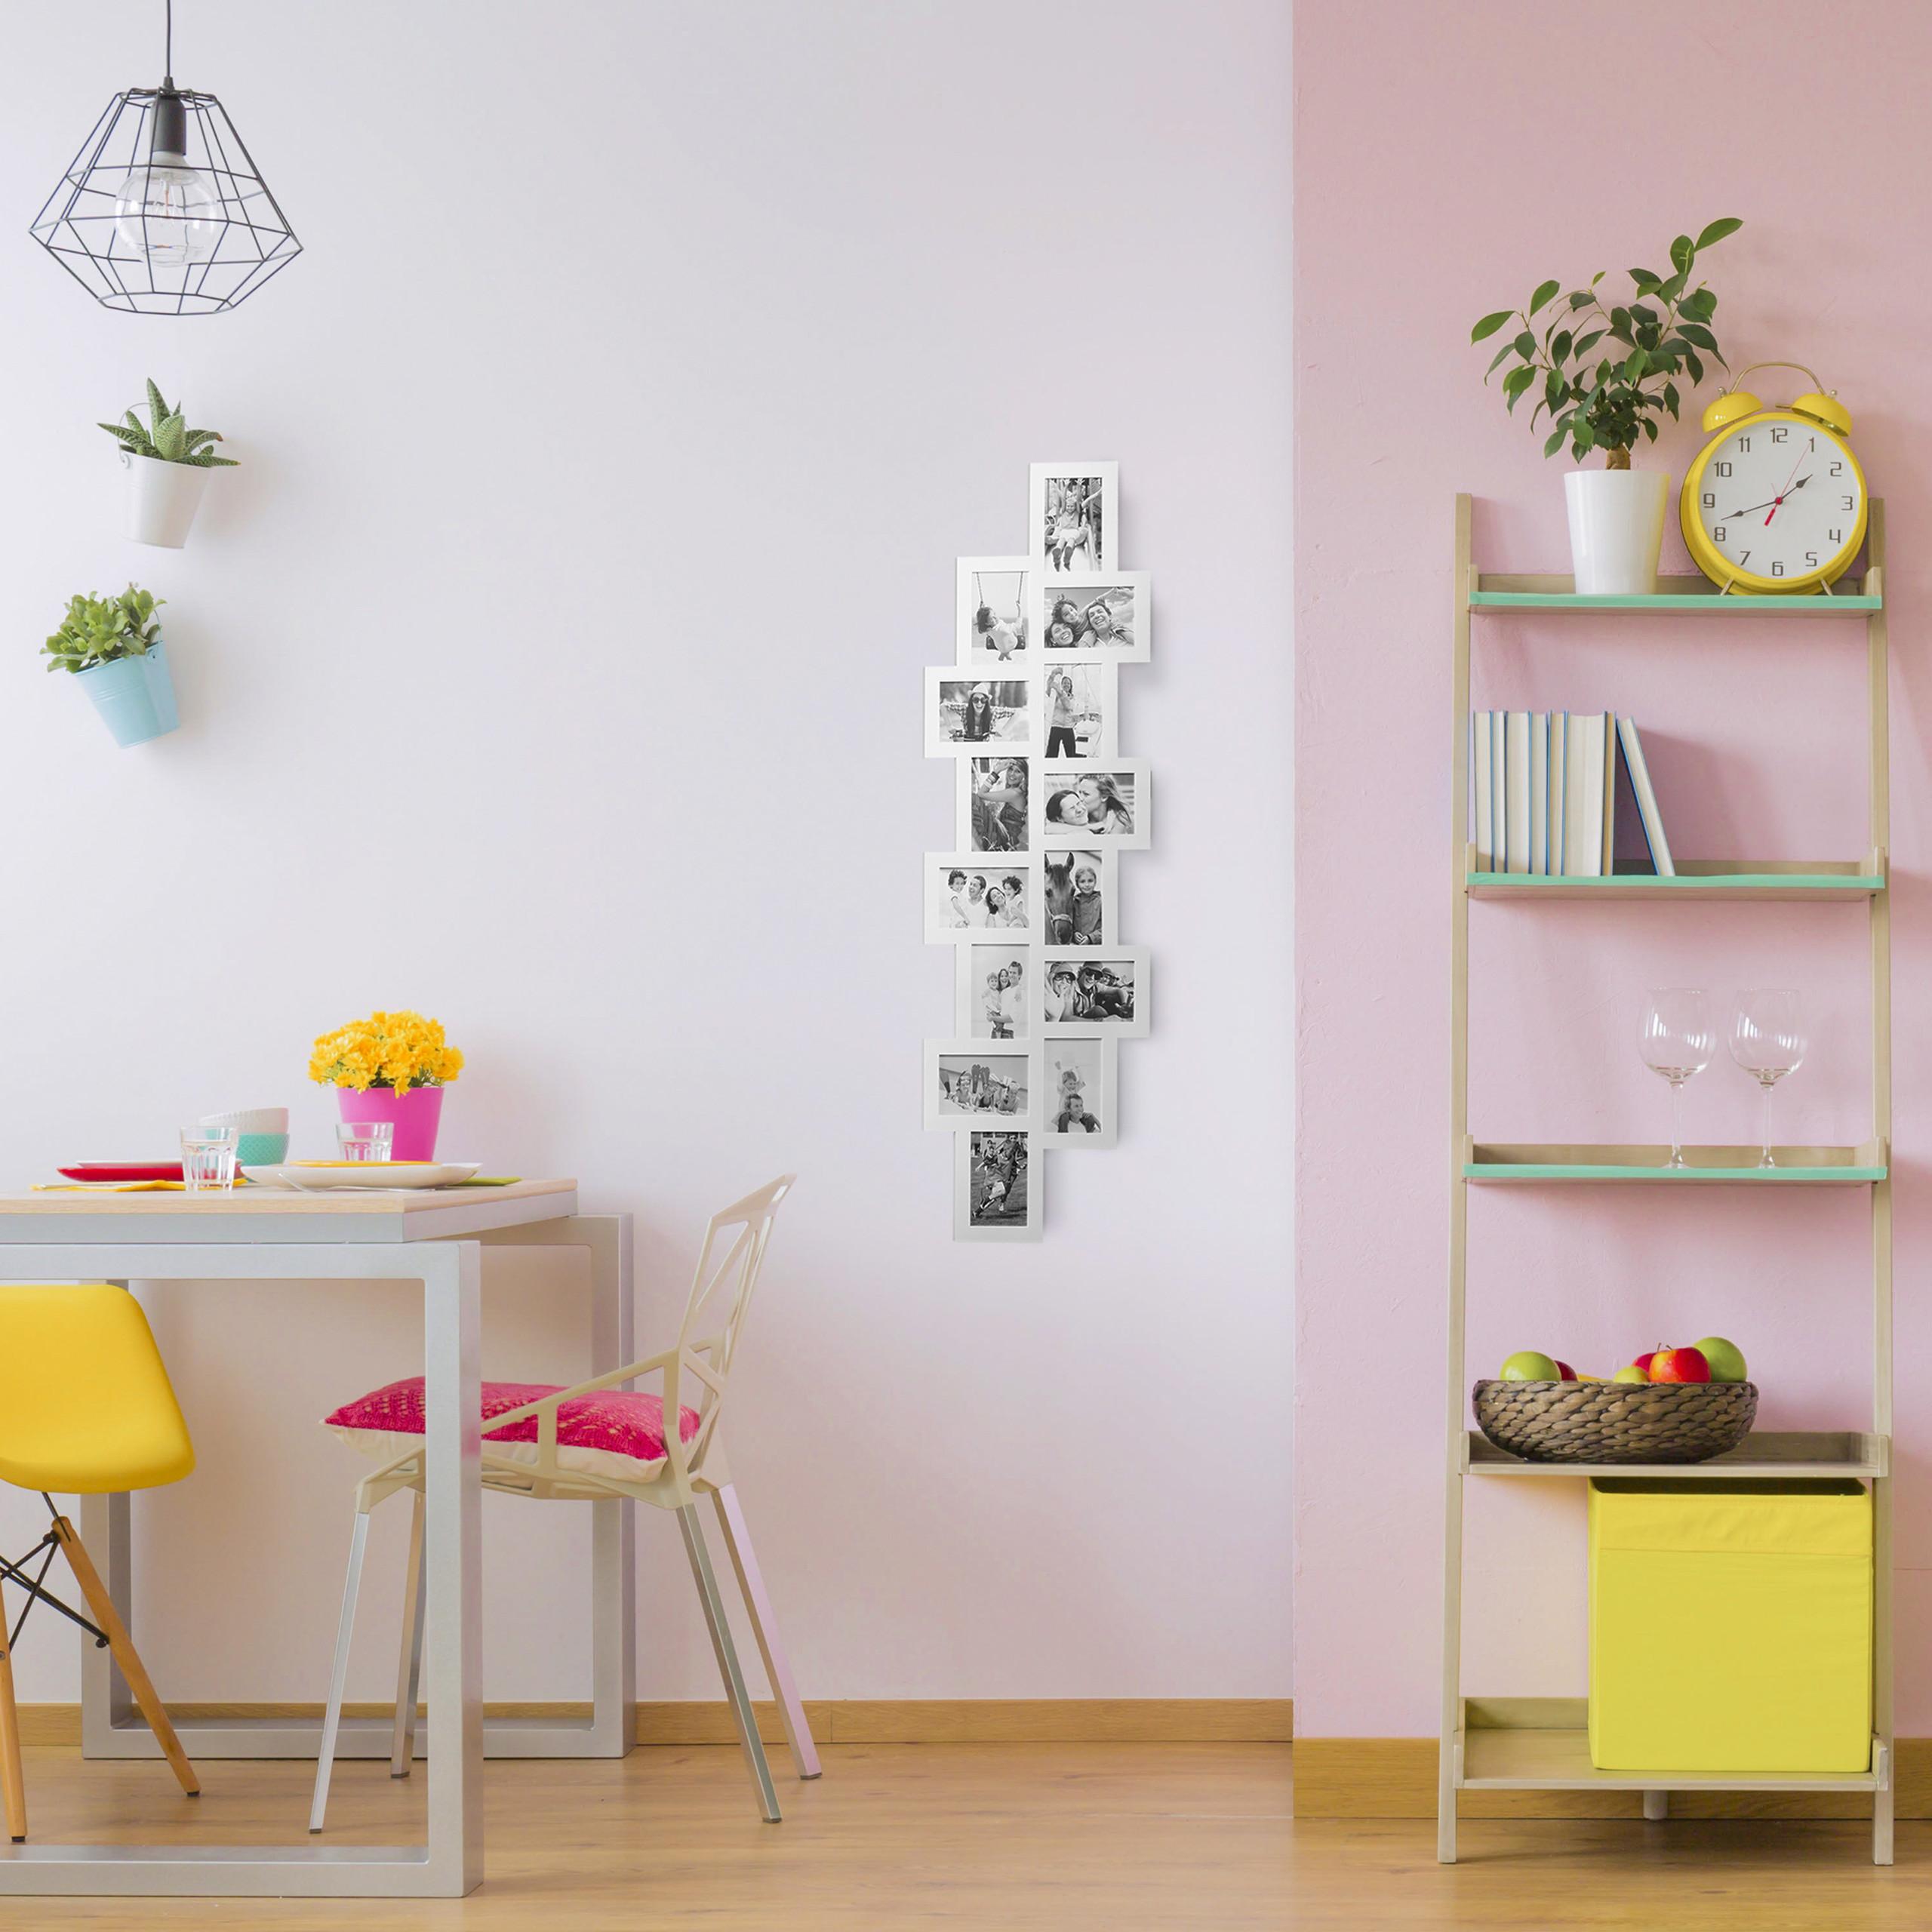 bilderrahmen collage f r 14 fotos mehrfachbilderrahmen fotocollage xxl rahmen ebay. Black Bedroom Furniture Sets. Home Design Ideas